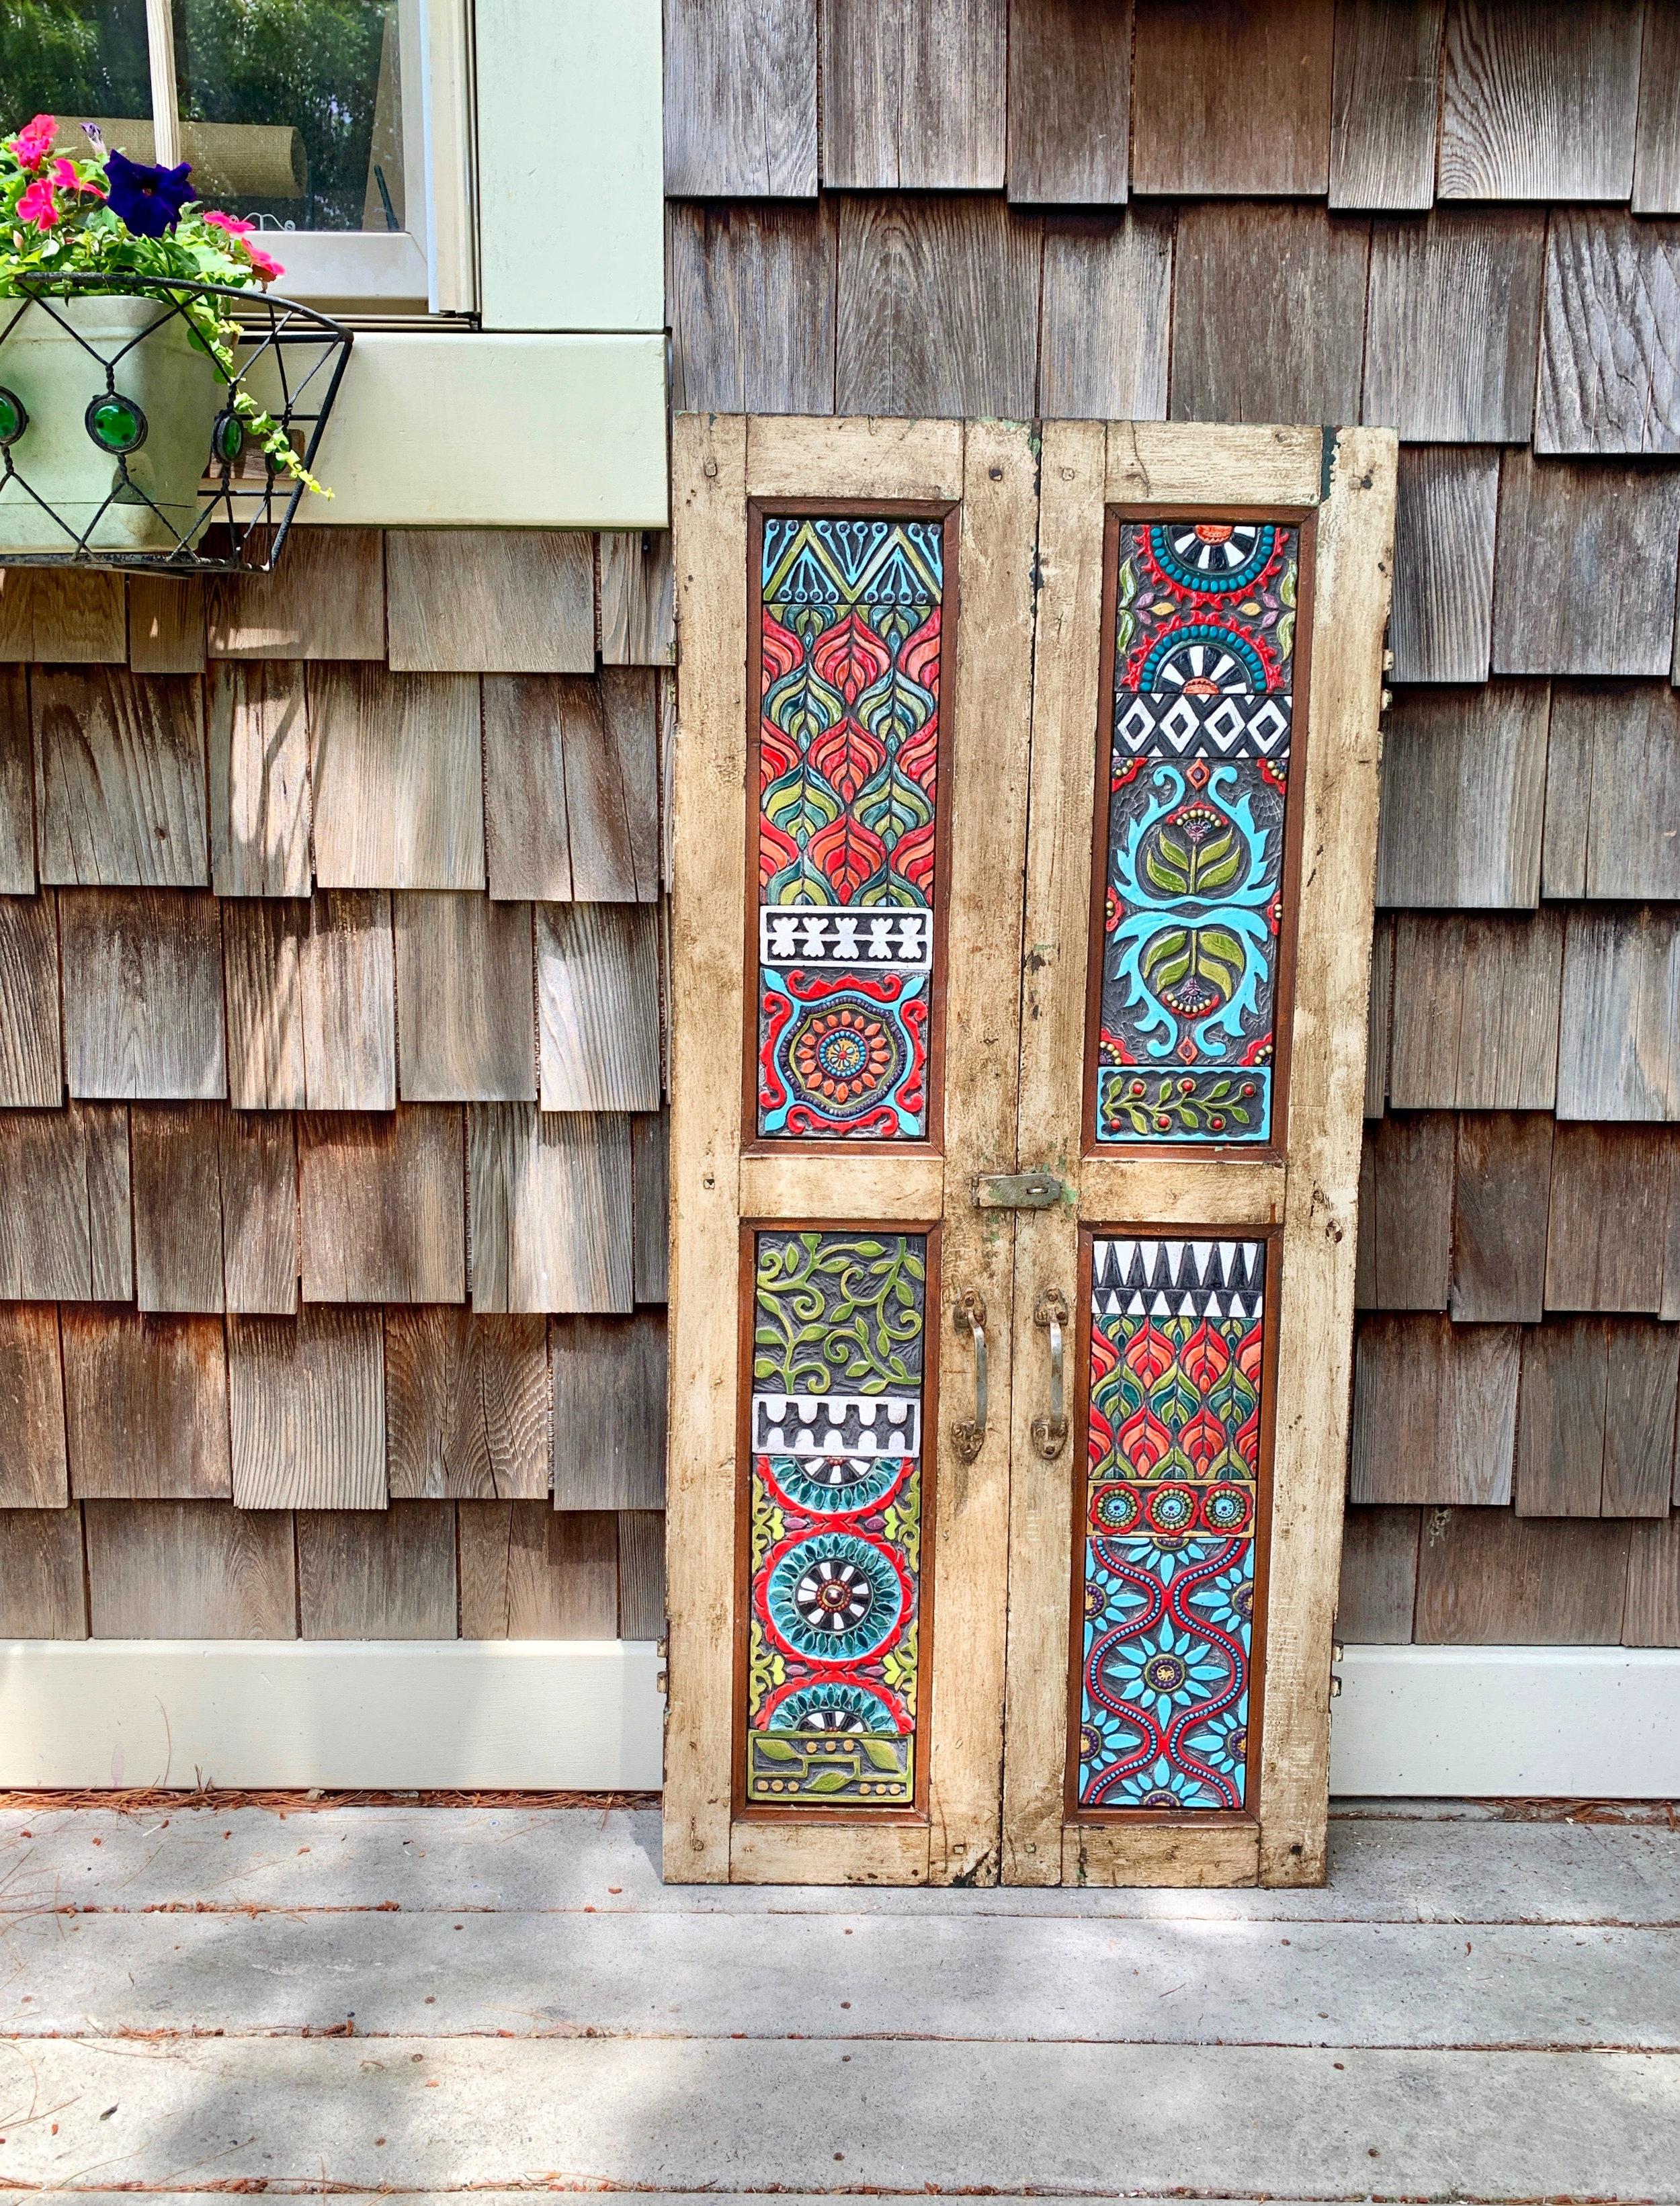 Repurposed Vintage Indian Teak Shutters with Handmade Ceramic Tile Mosaic Art